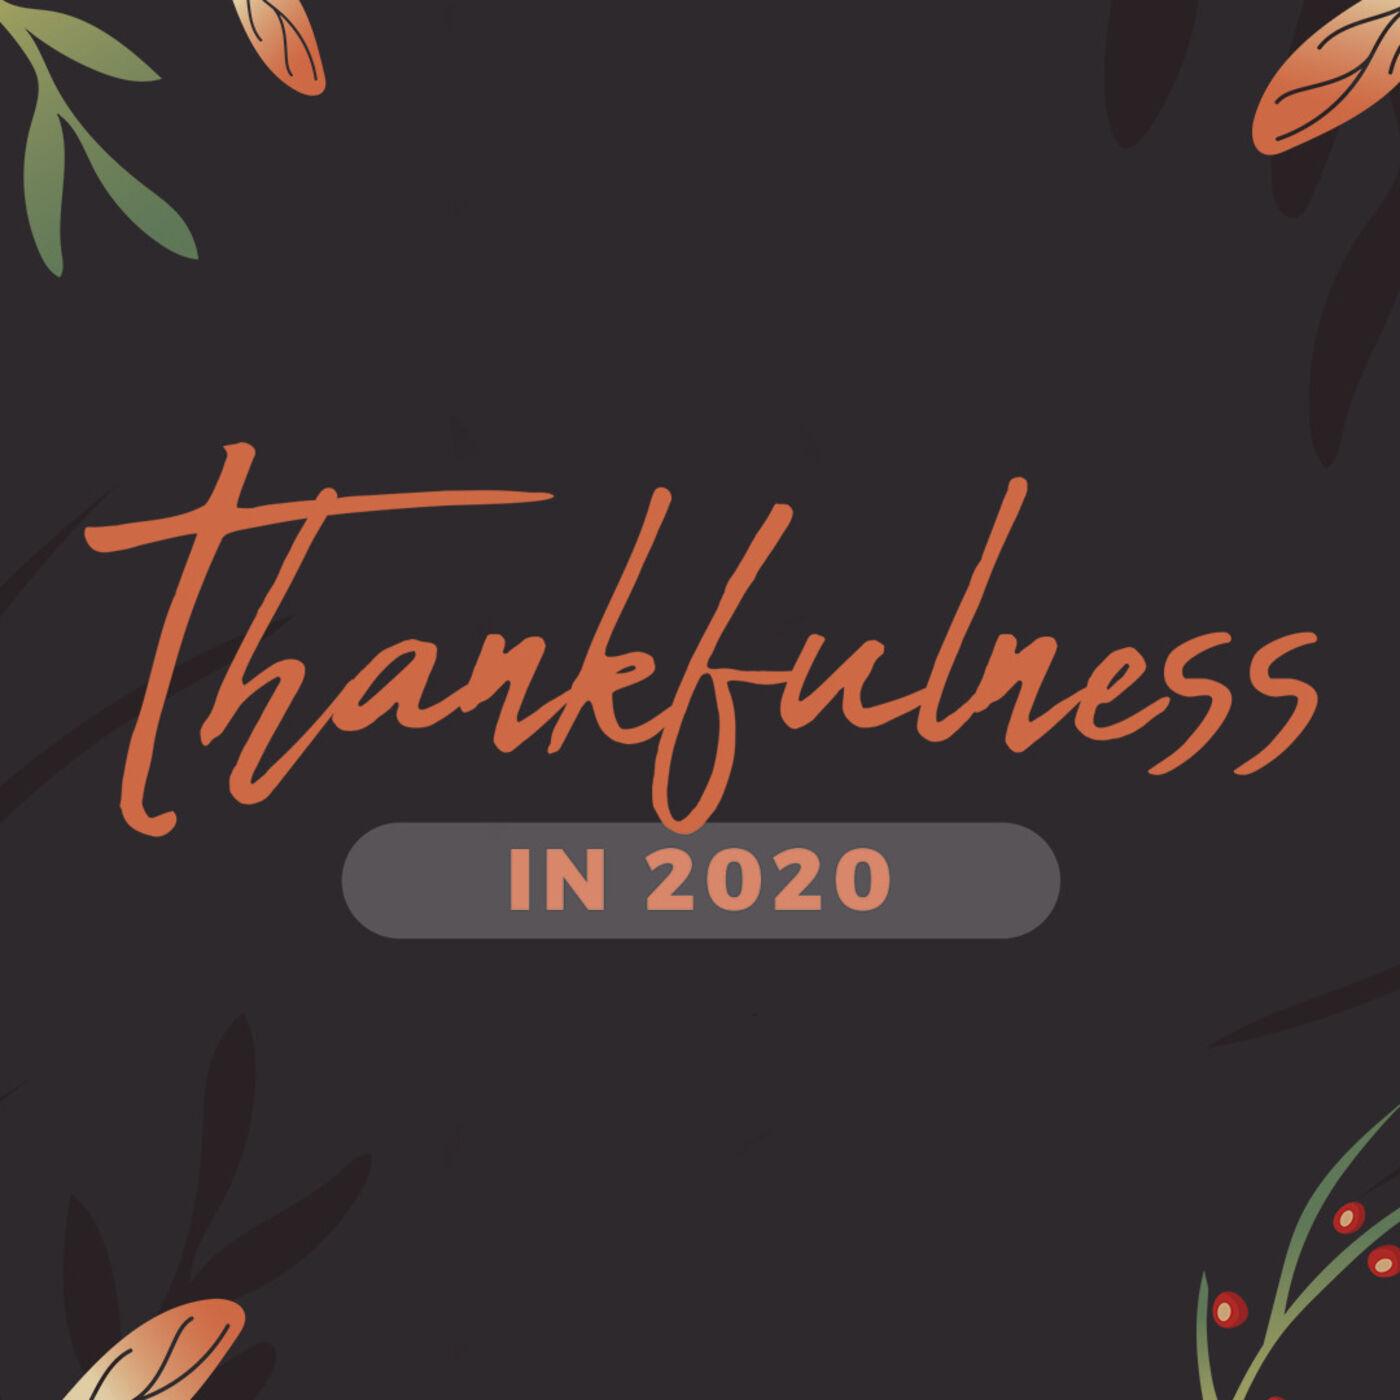 Thankfulness in 2020